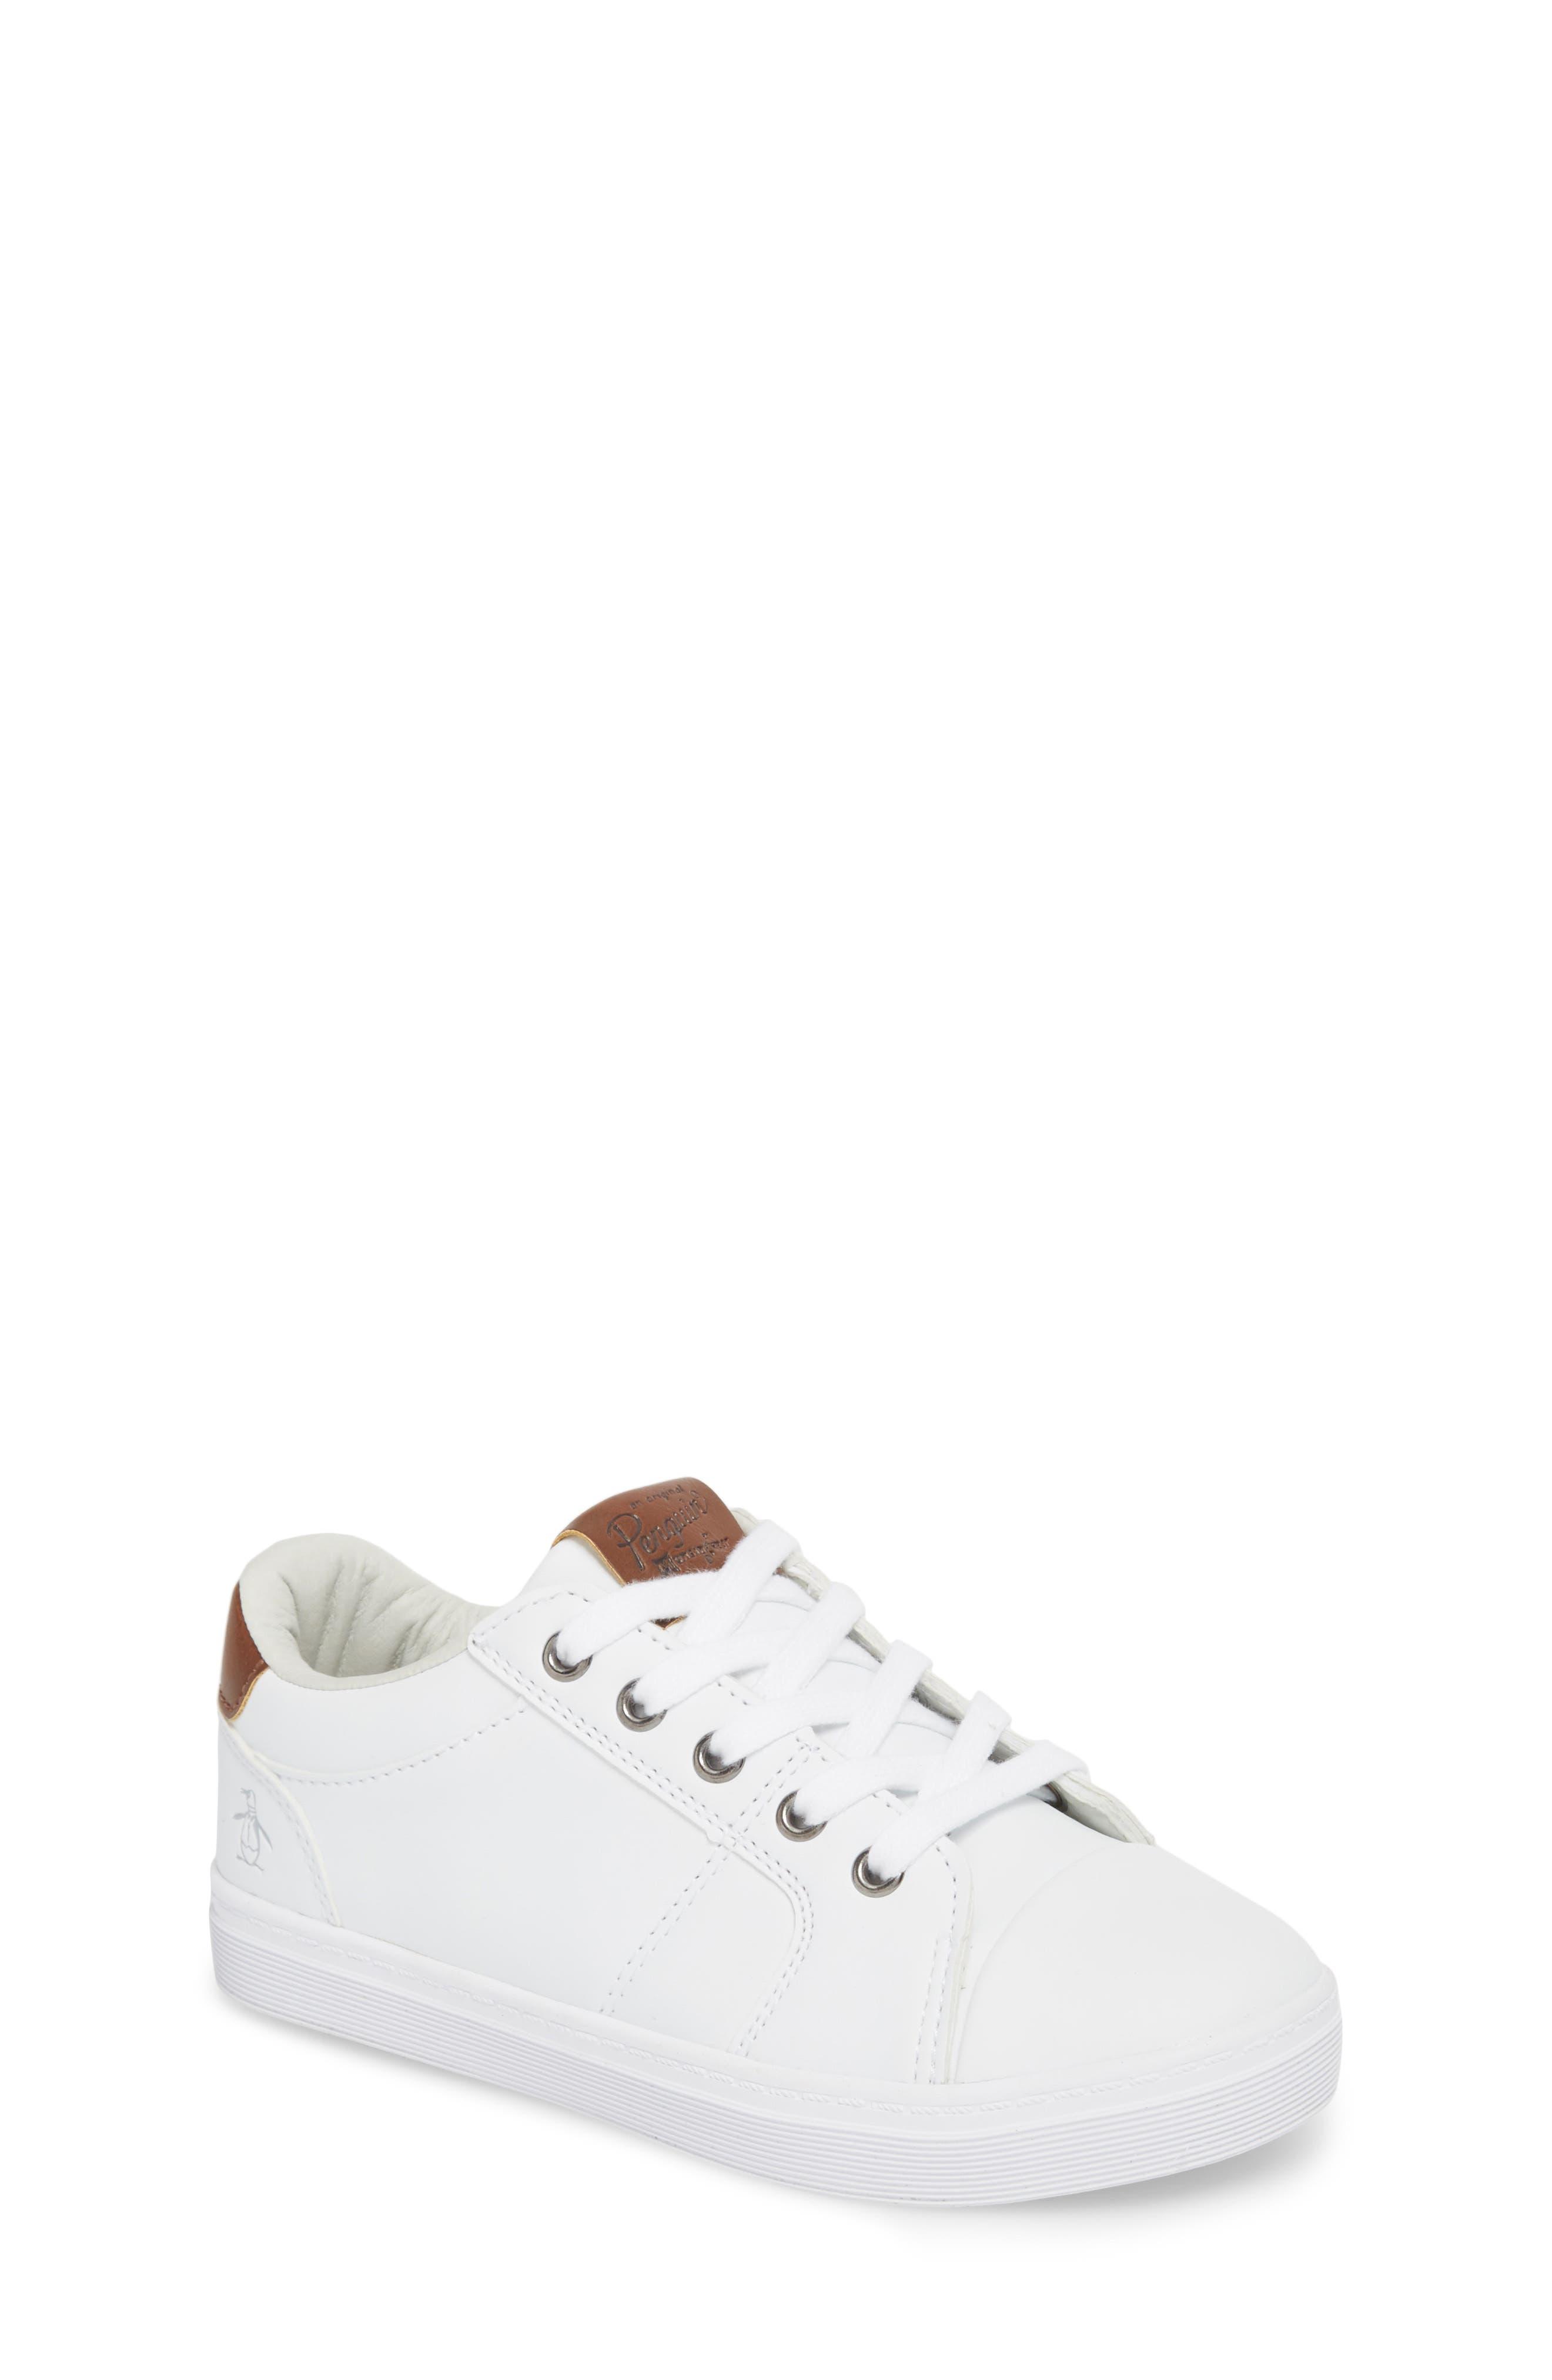 Cobin Sneaker,                             Main thumbnail 1, color,                             White/ Cognac